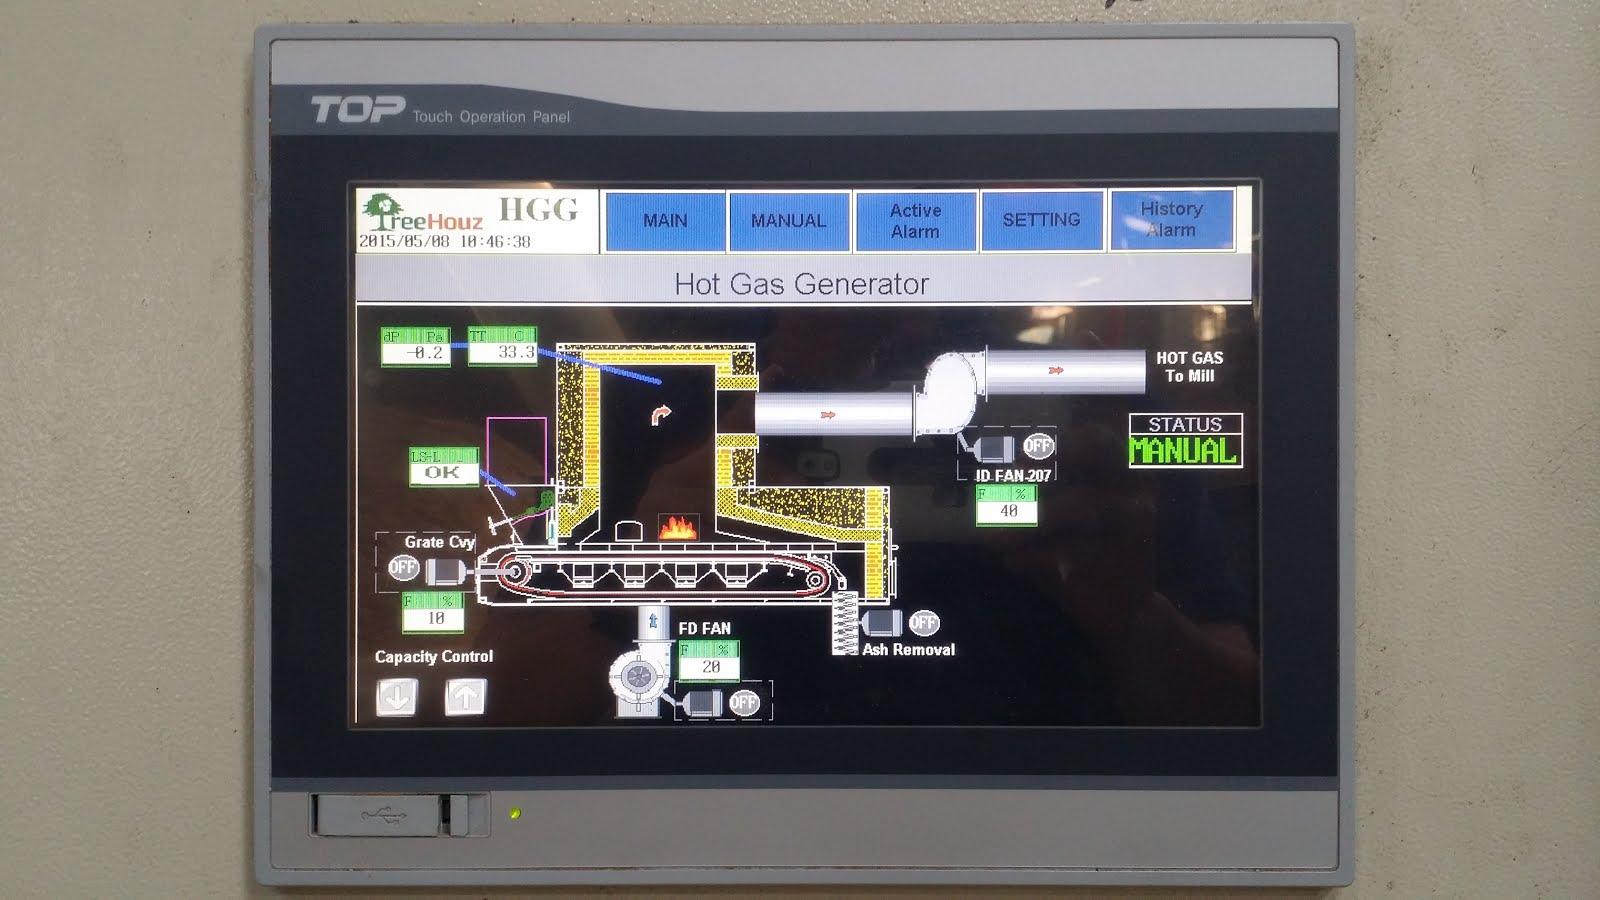 HGG HMI Control